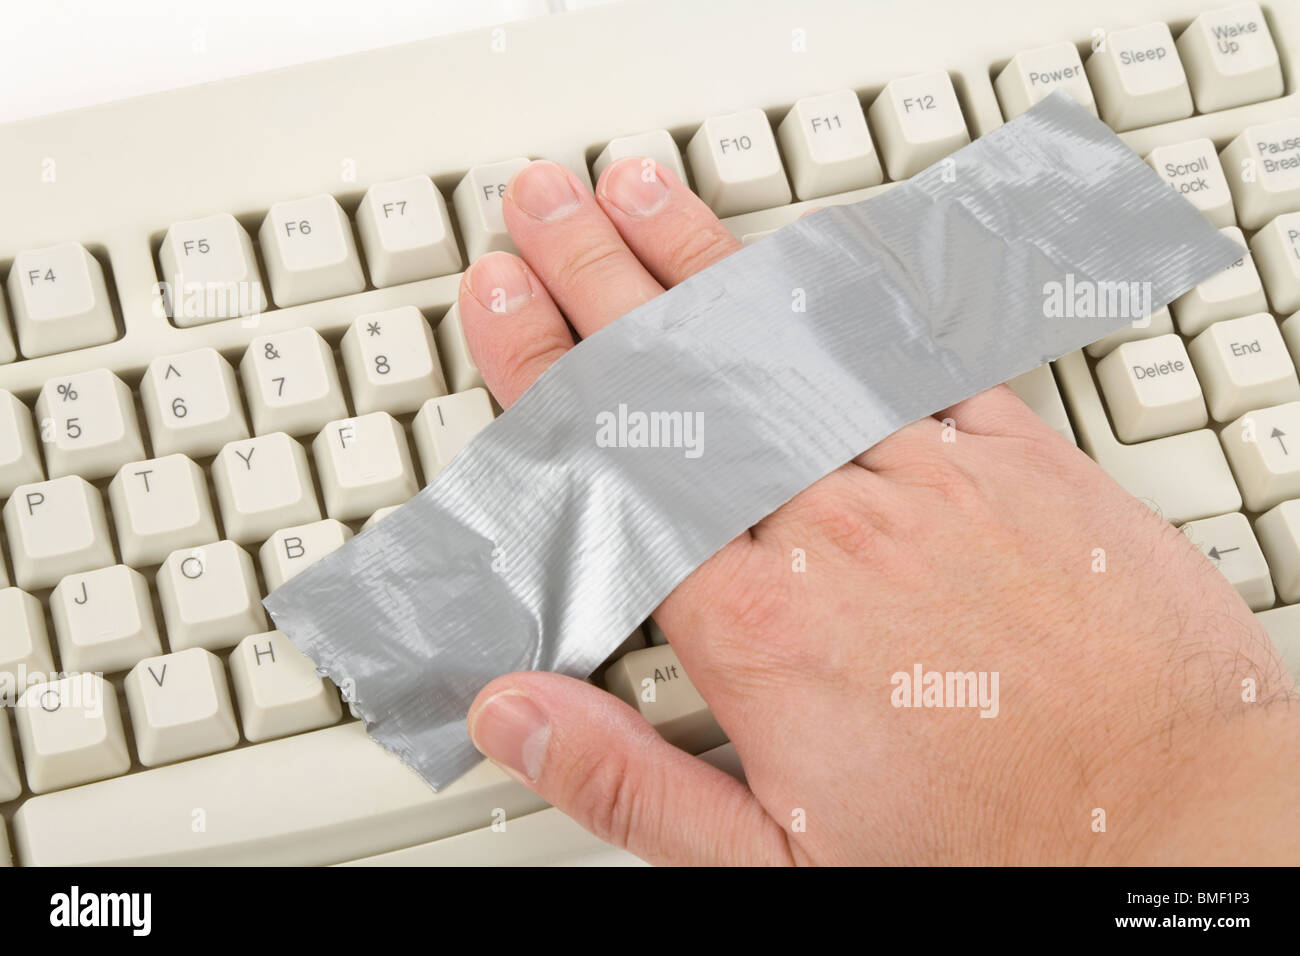 Hand had been stuck on Computer Keyboard - Stock Image